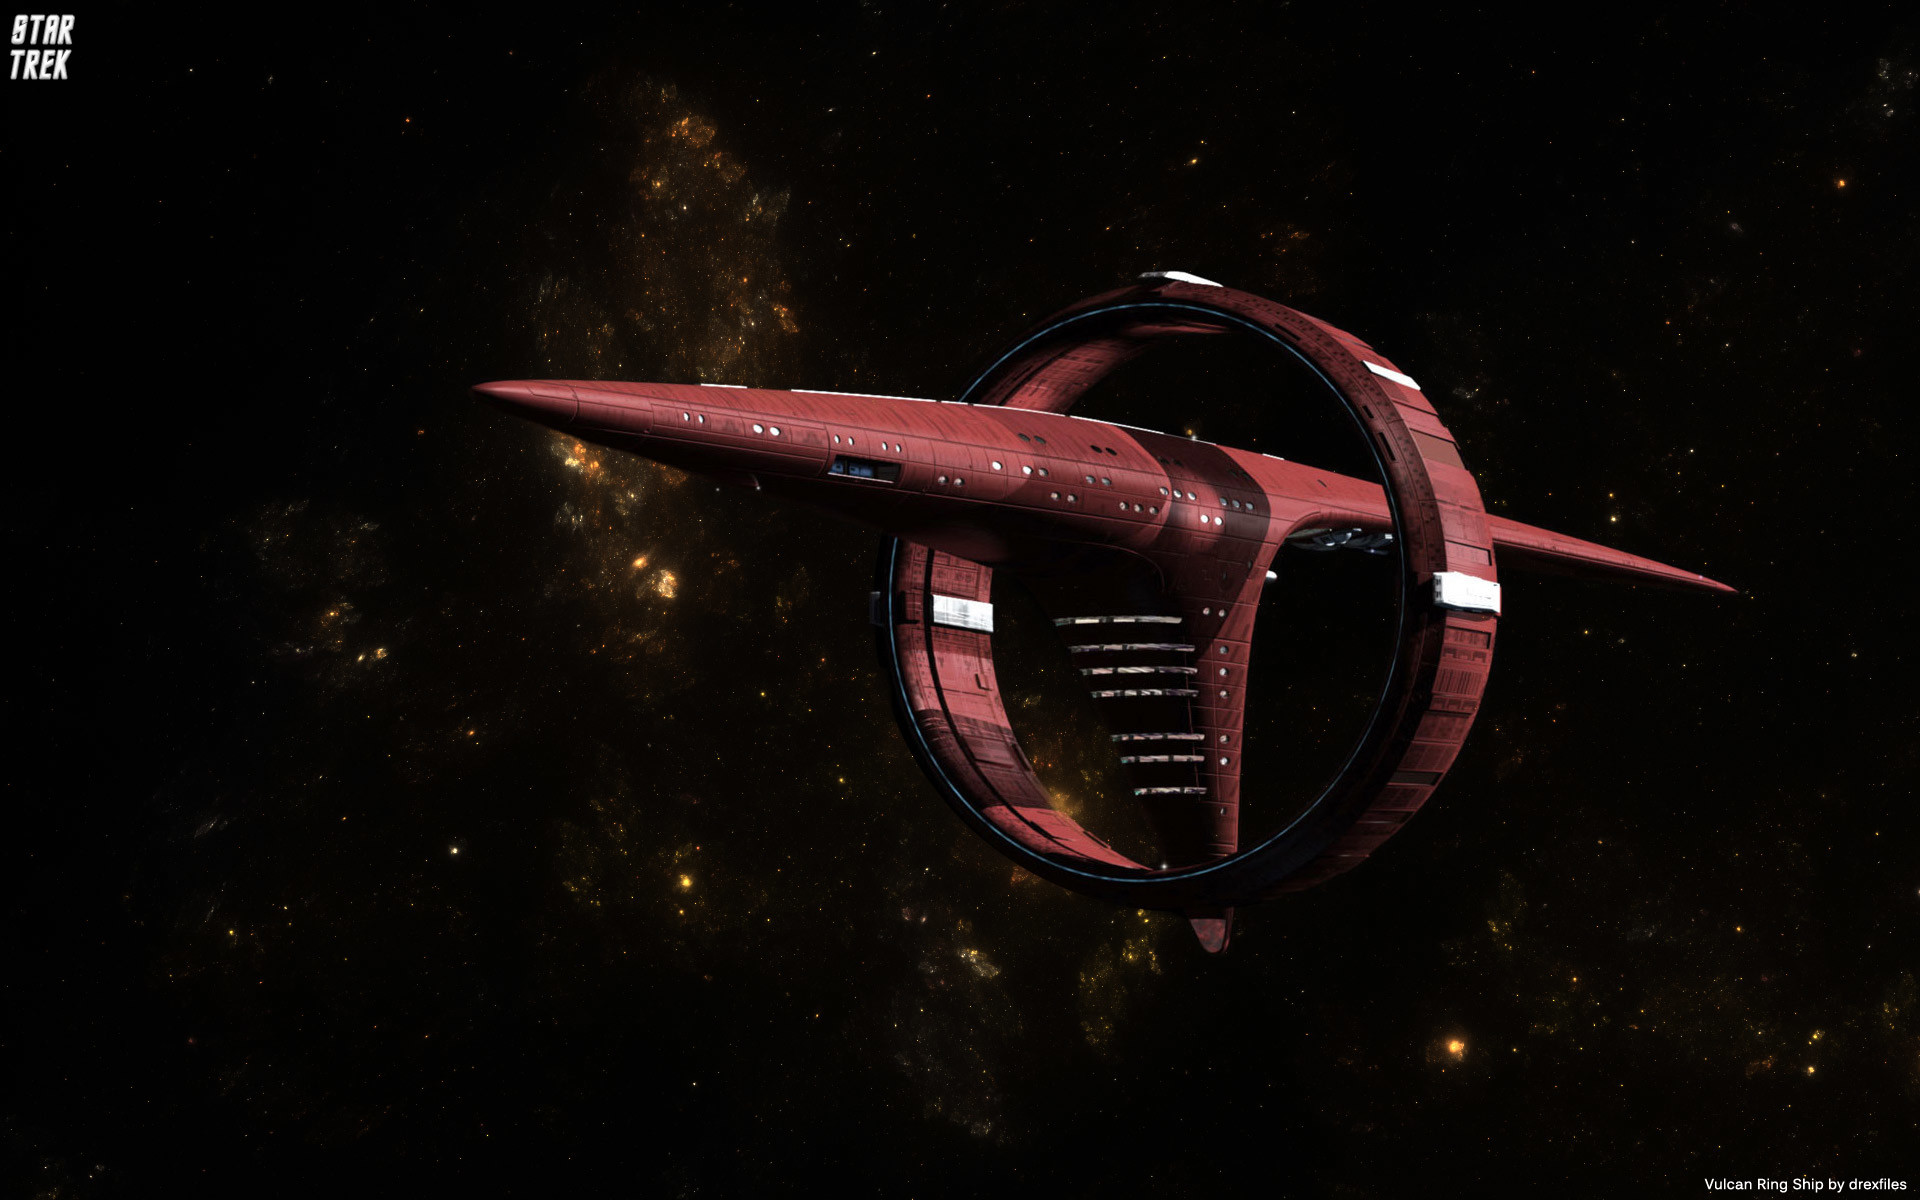 Star Trek Vulcan Ships wallpaper – 910851